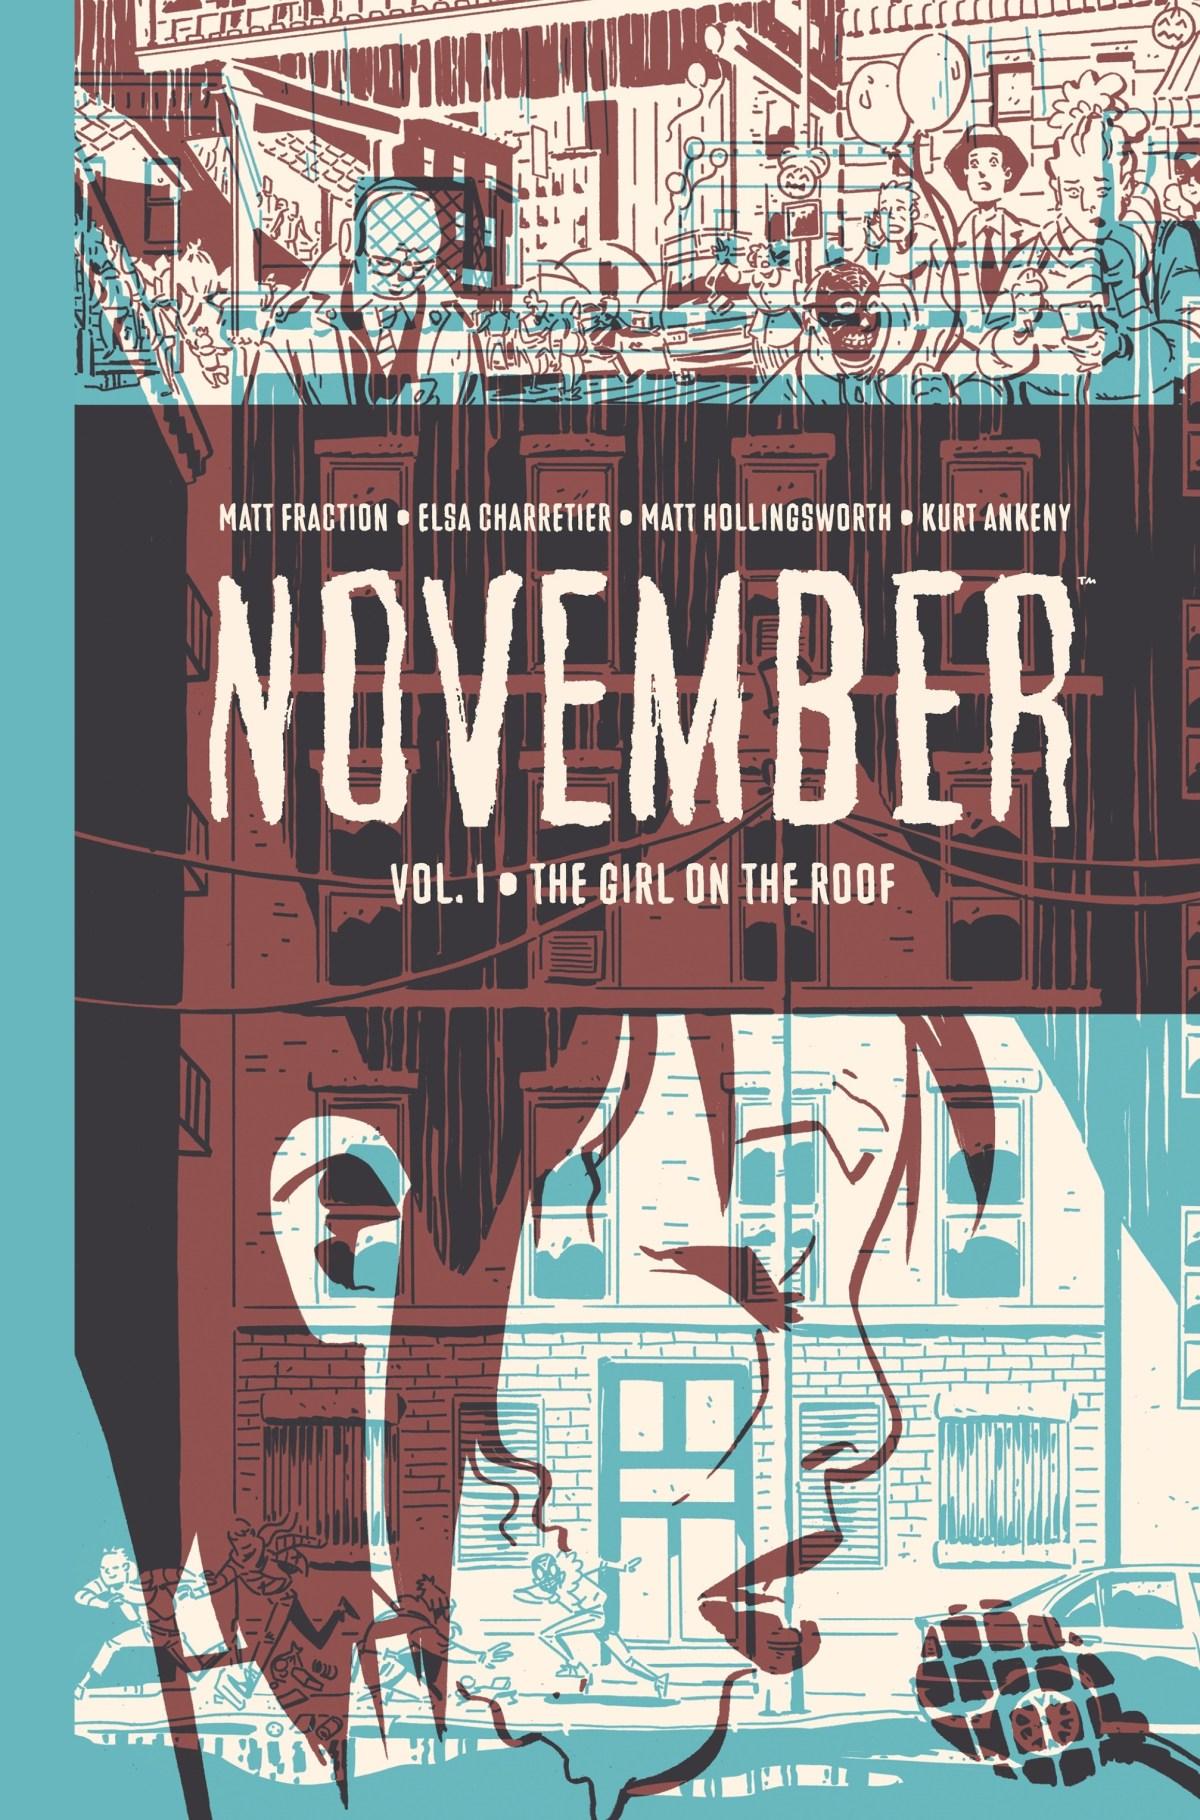 Cover Image. November Volume I, Image Comics (2019).